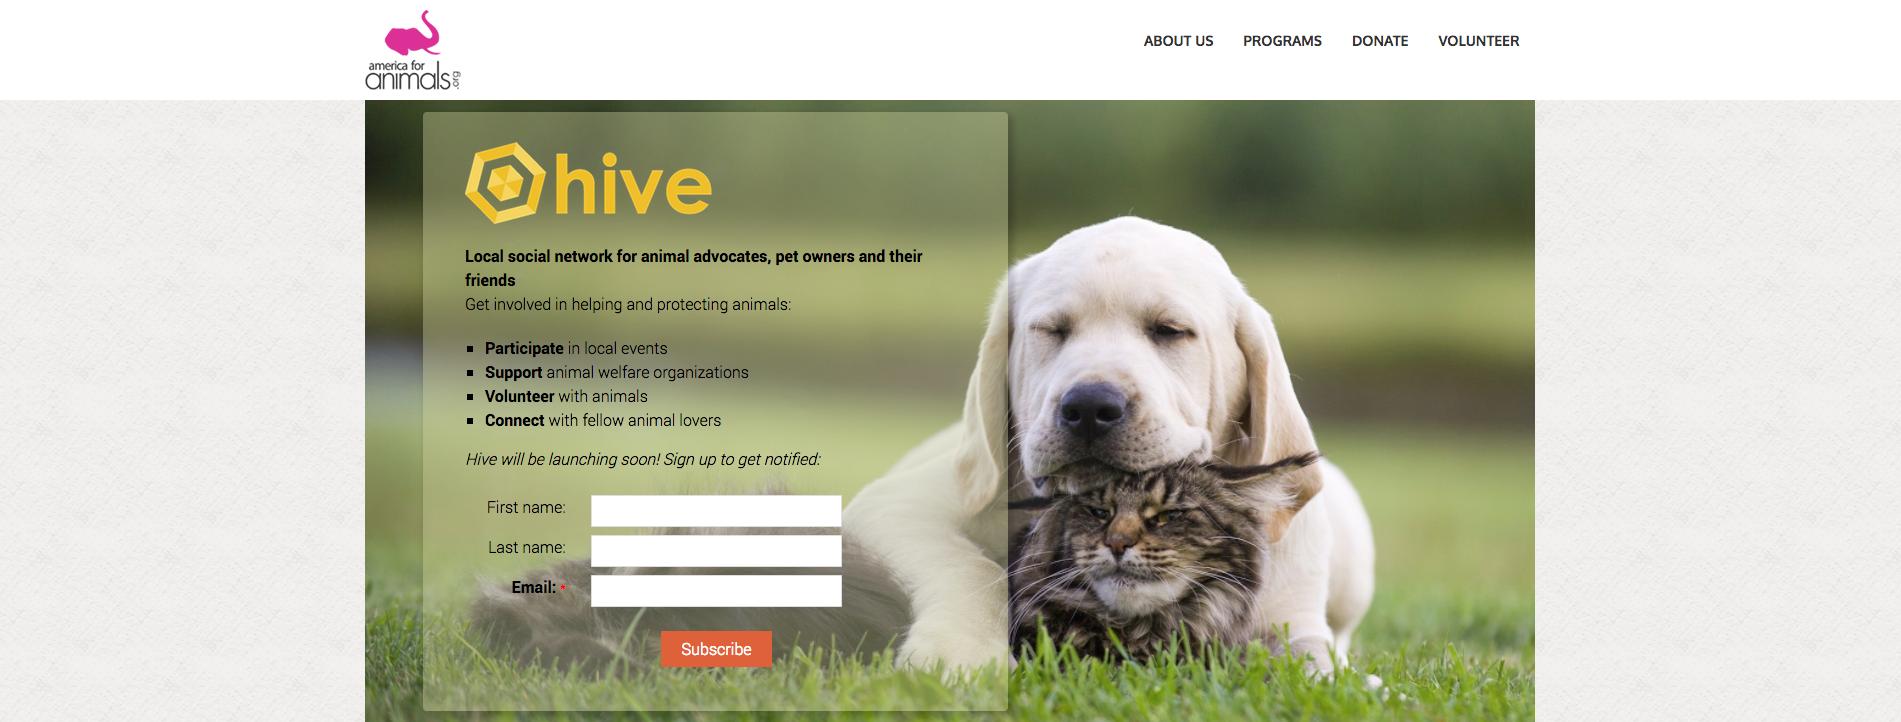 hive america for animals portfolio